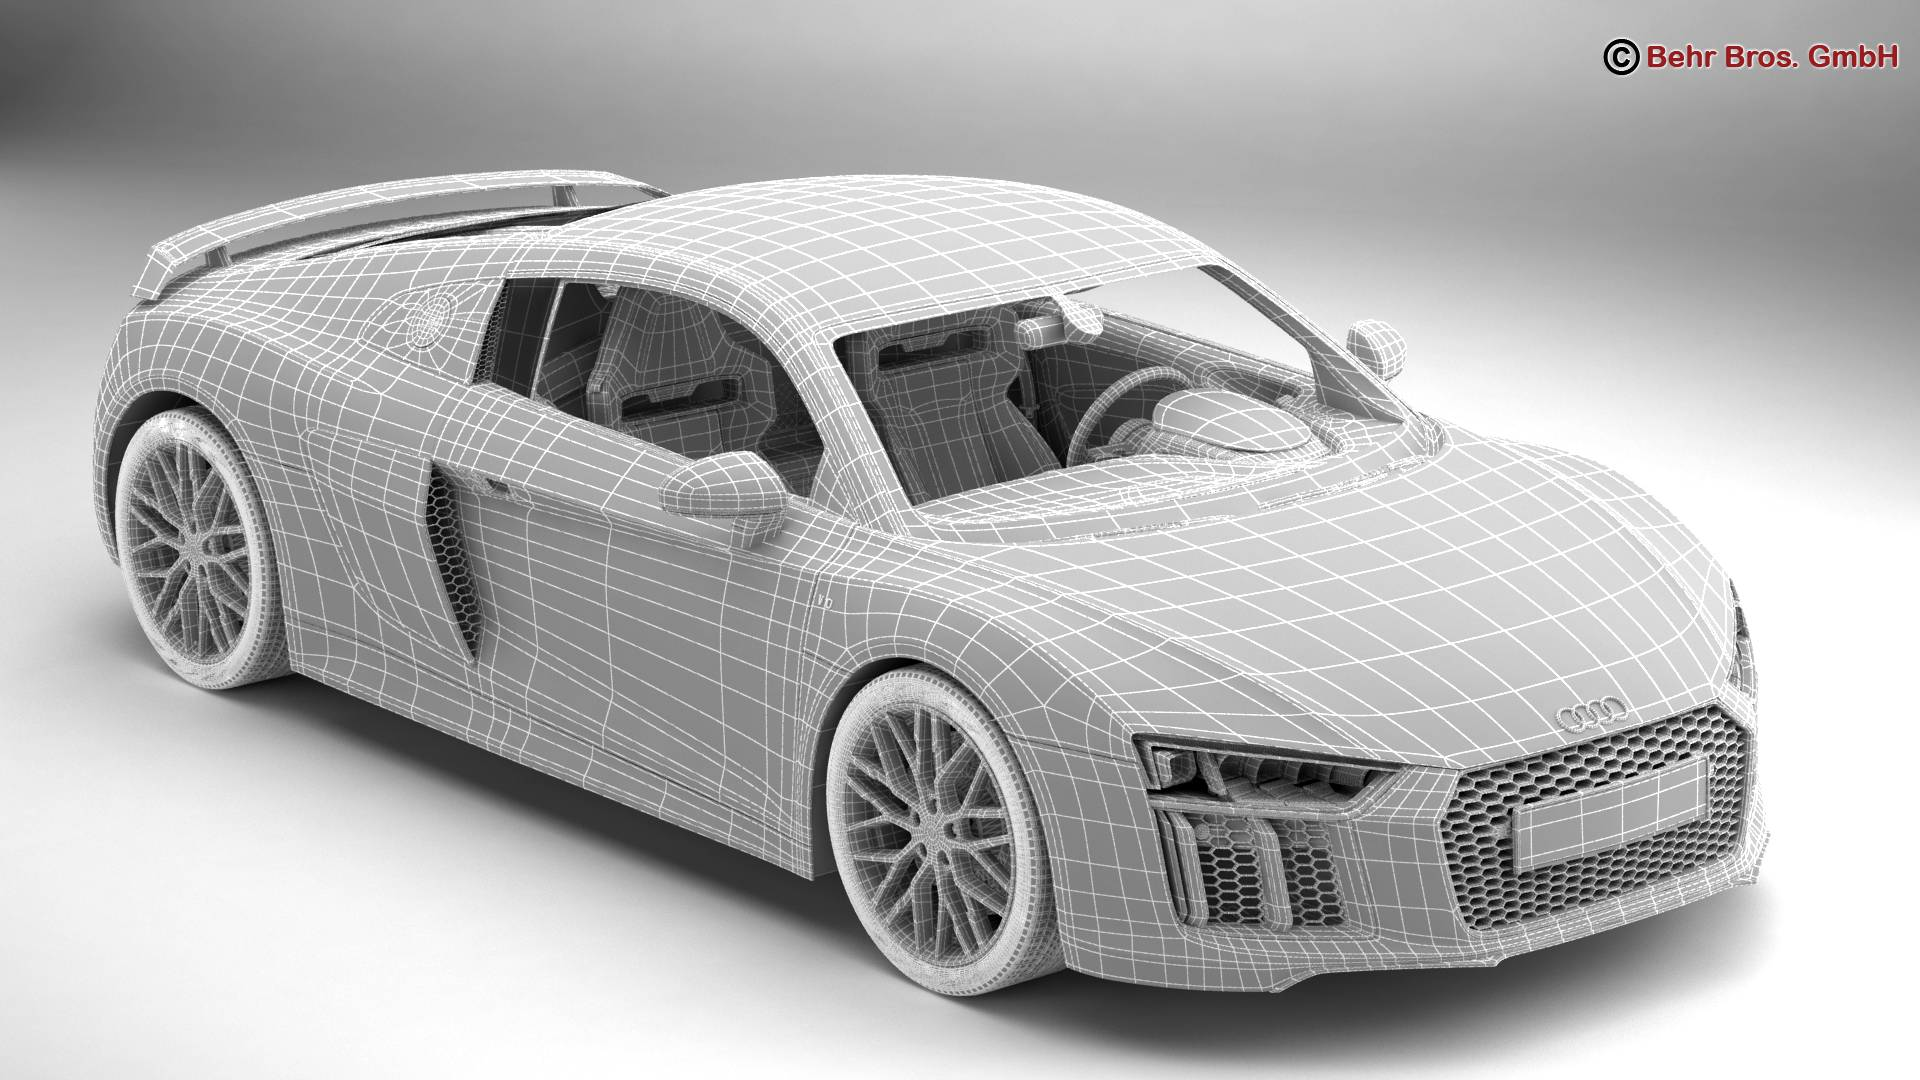 Audi R8 V10 Plus 2016 3D Model – Buy Audi R8 V10 Plus 2016 3D Model   FlatPyramid